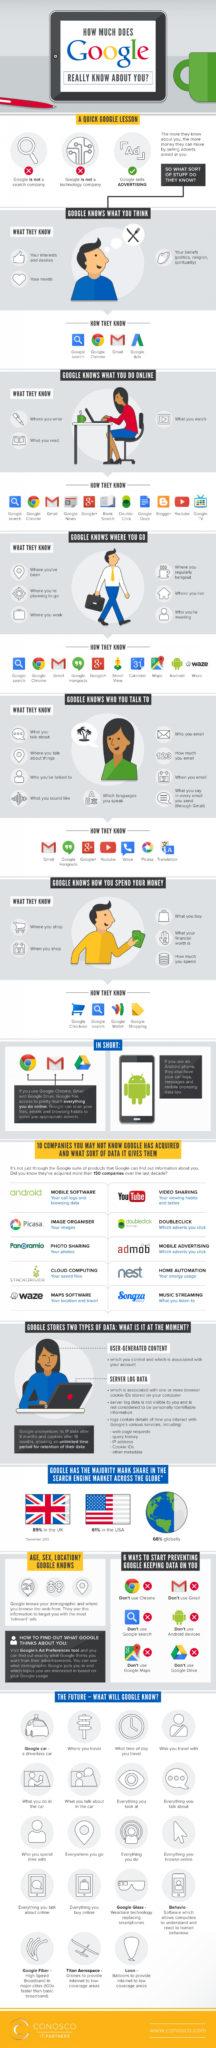 que-sabe-google-sobre-nosotros-infografia